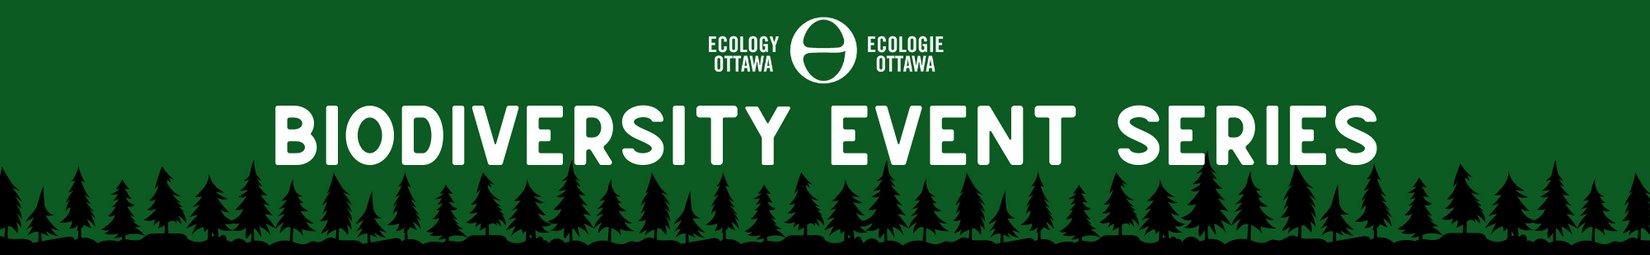 Ecology Ottawa's Biodiversity Event Series